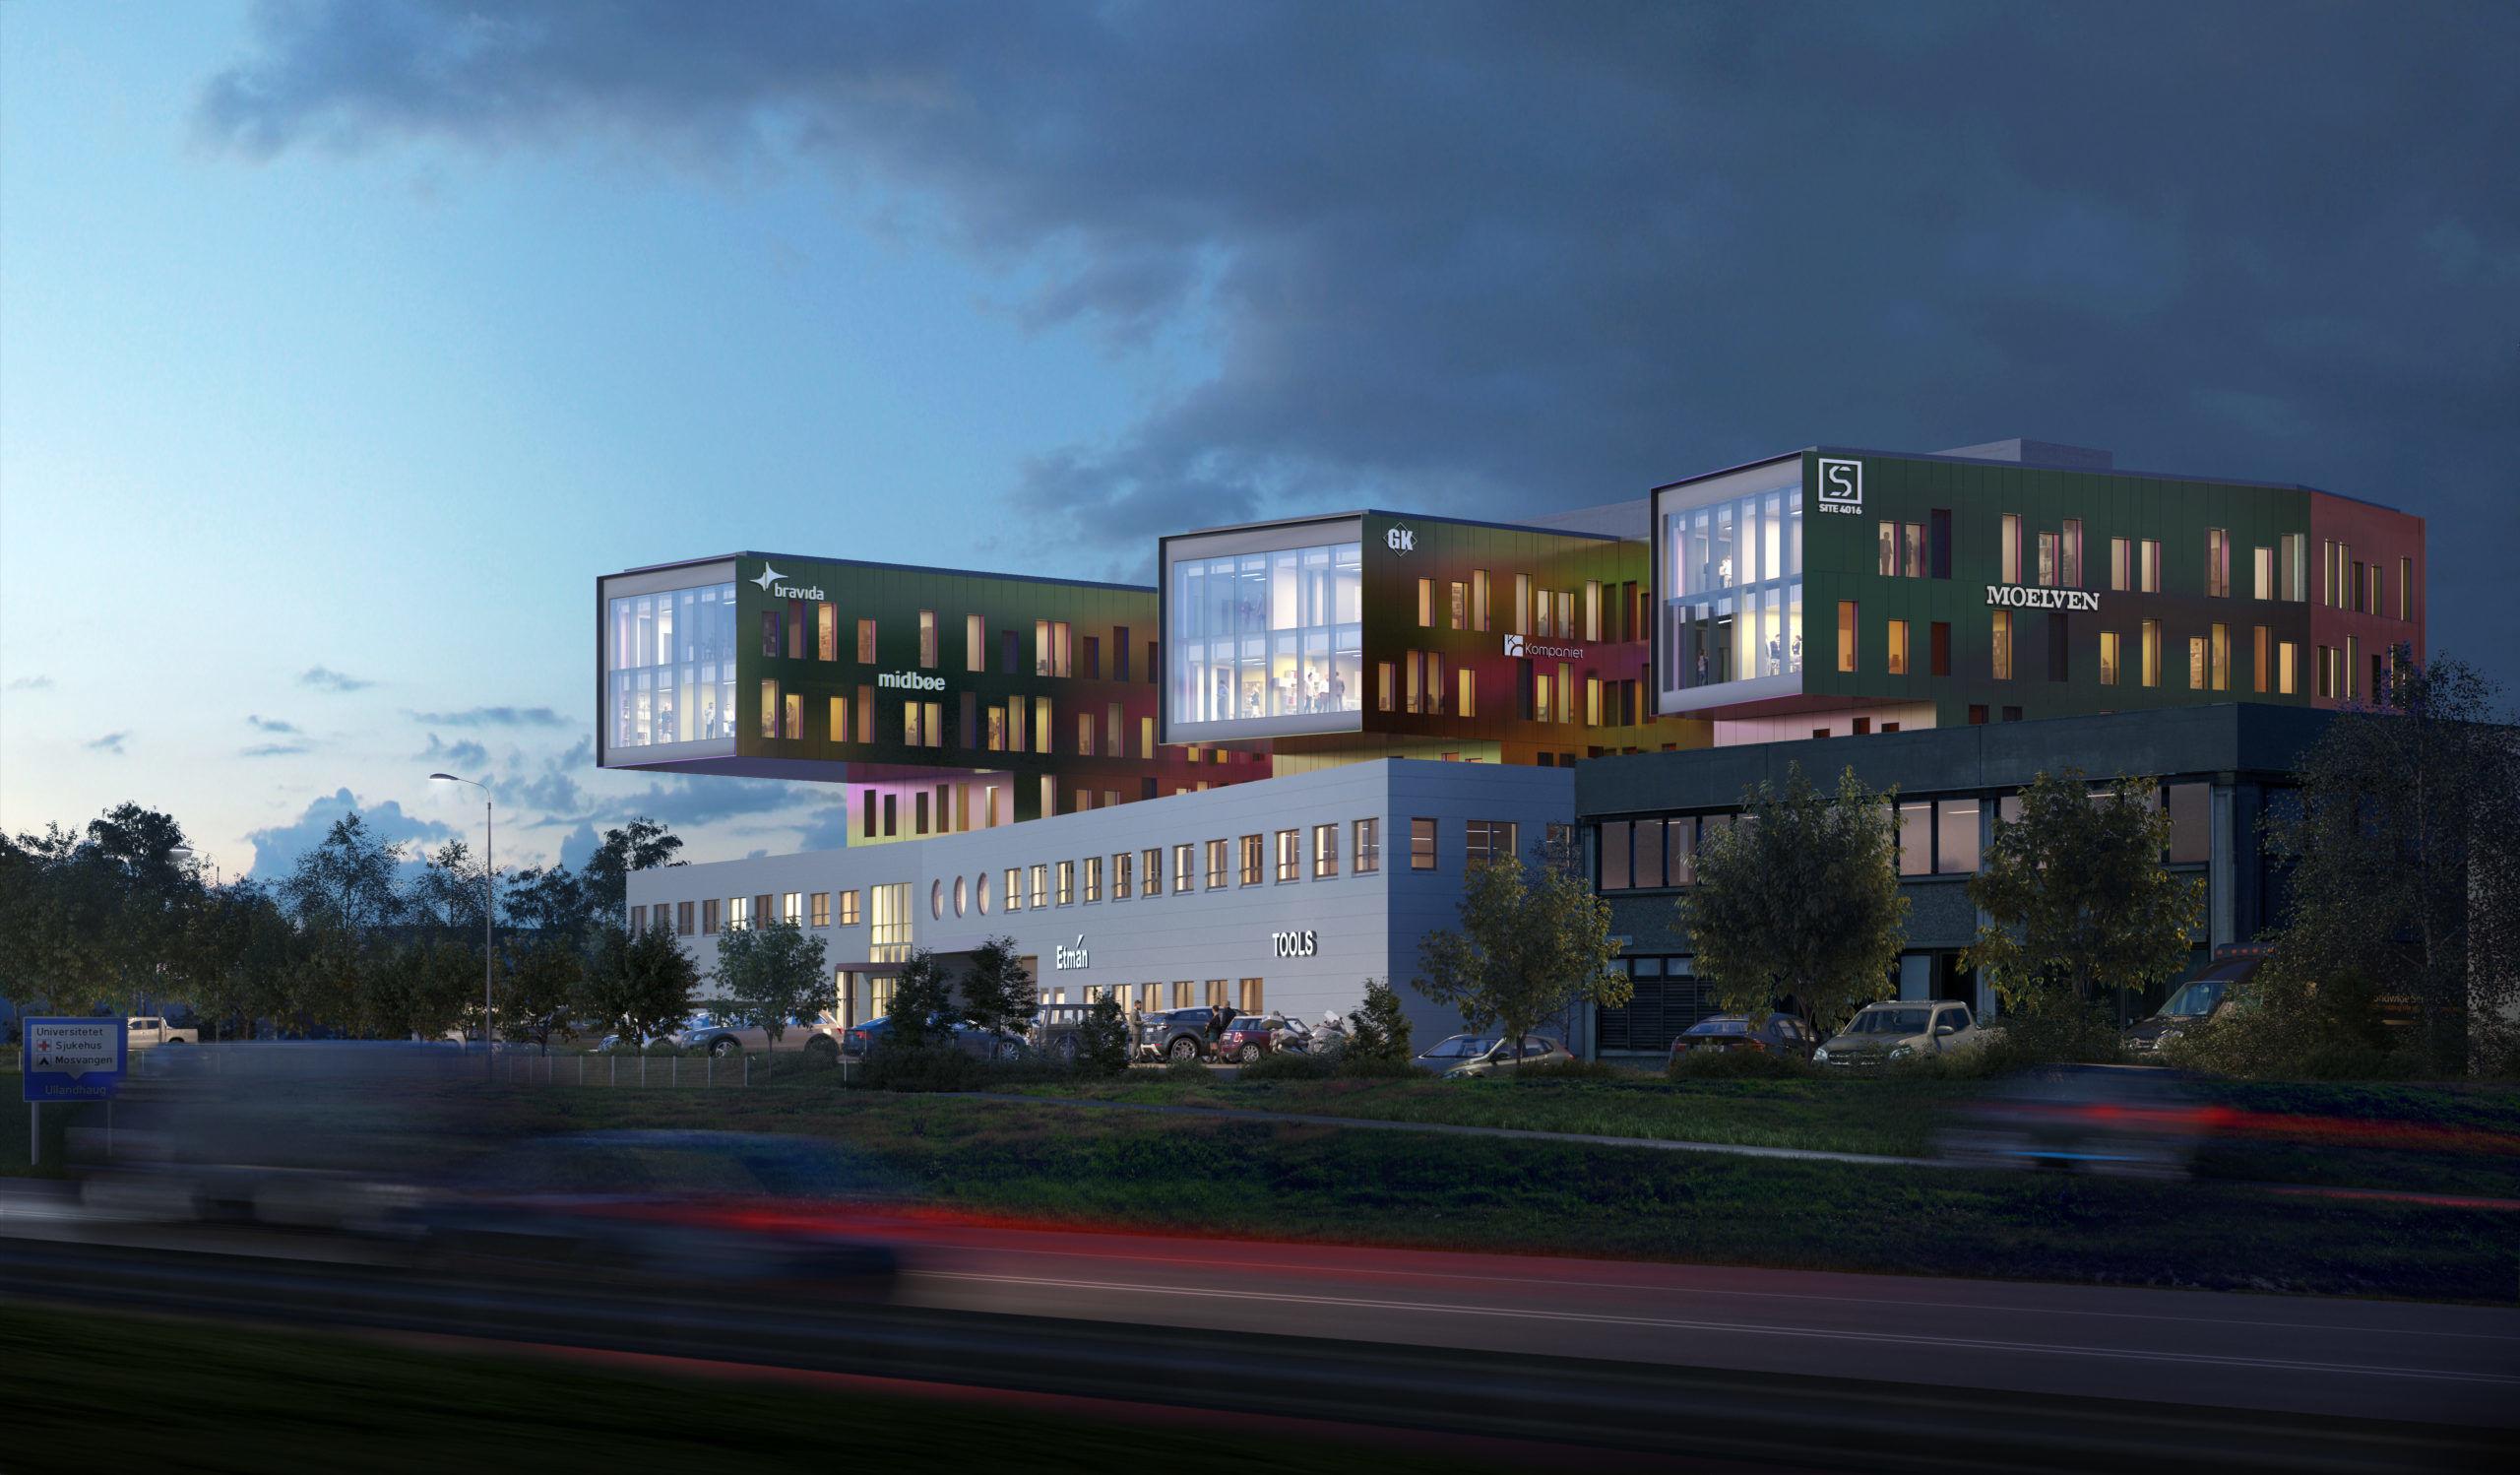 Site 4016: ARK - New development - Smedvig